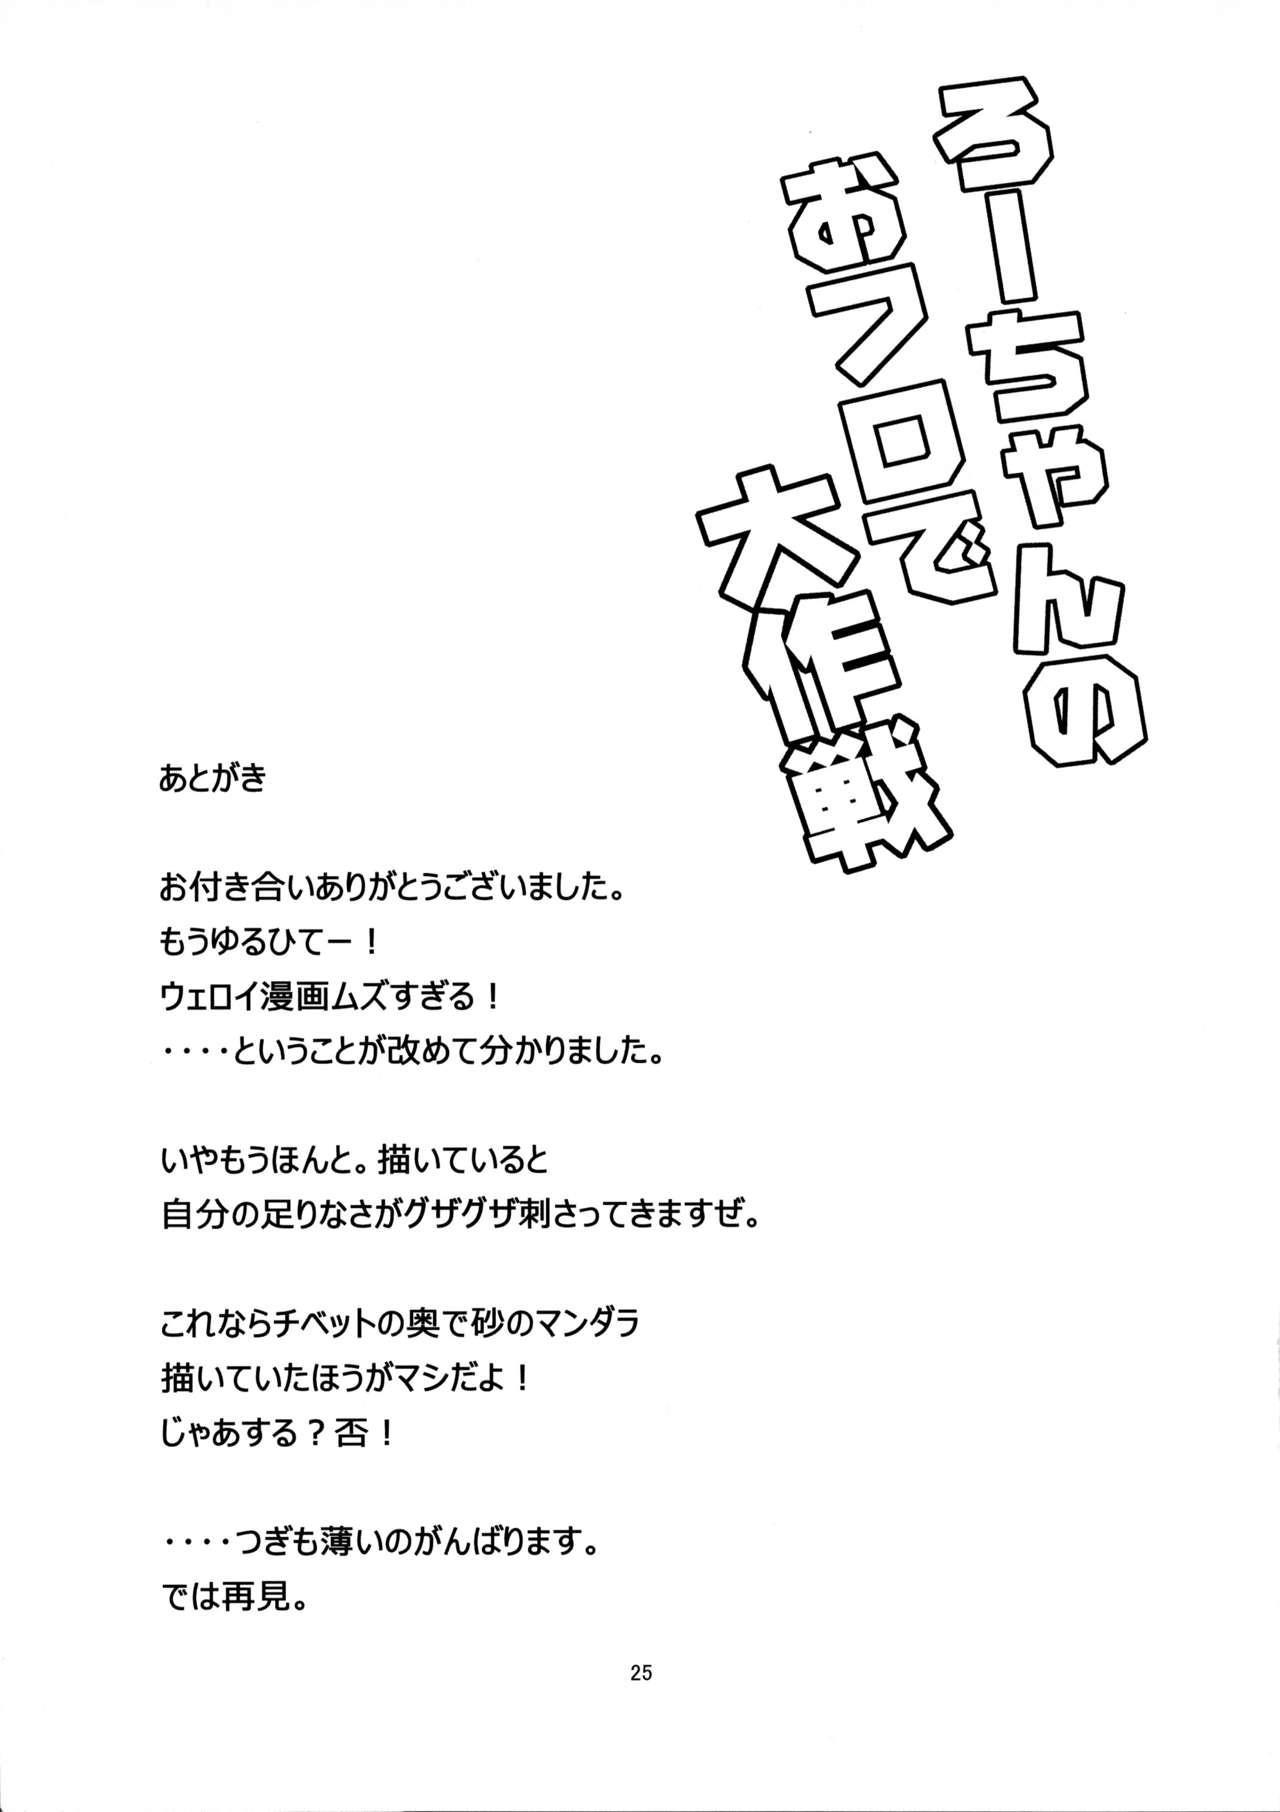 Ro-chan no Ofuro de Daisakusen 23